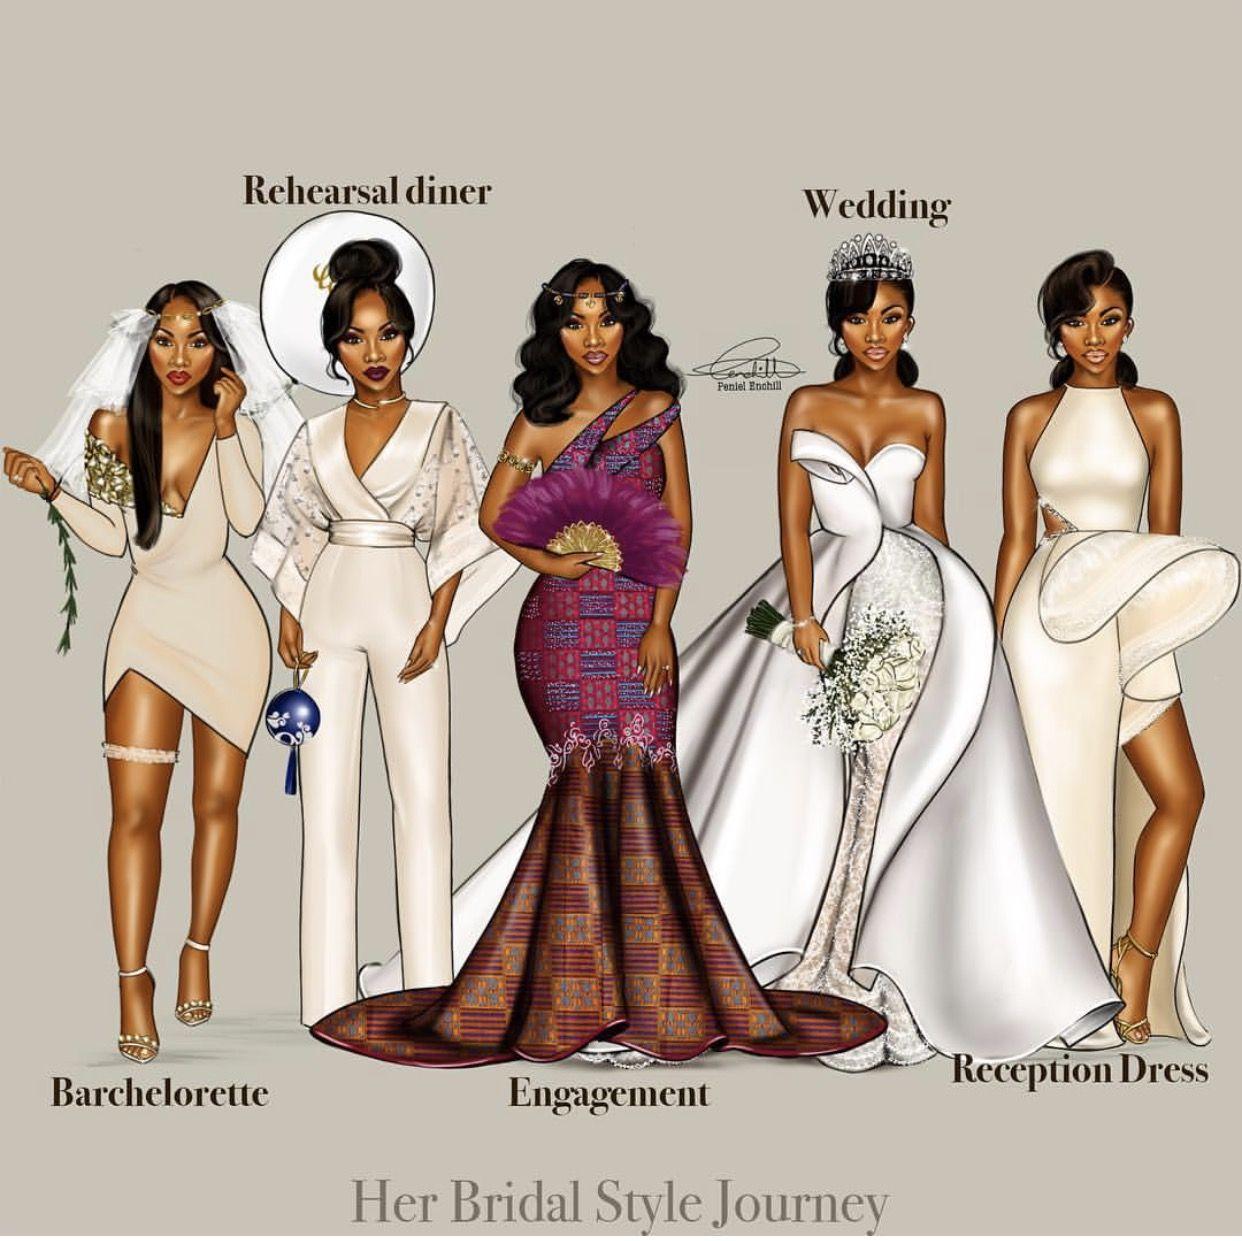 Cute wedding reception dresses for the bride  Pin by Gloria KusekiWazni on Wedding dresses  Pinterest  Wedding